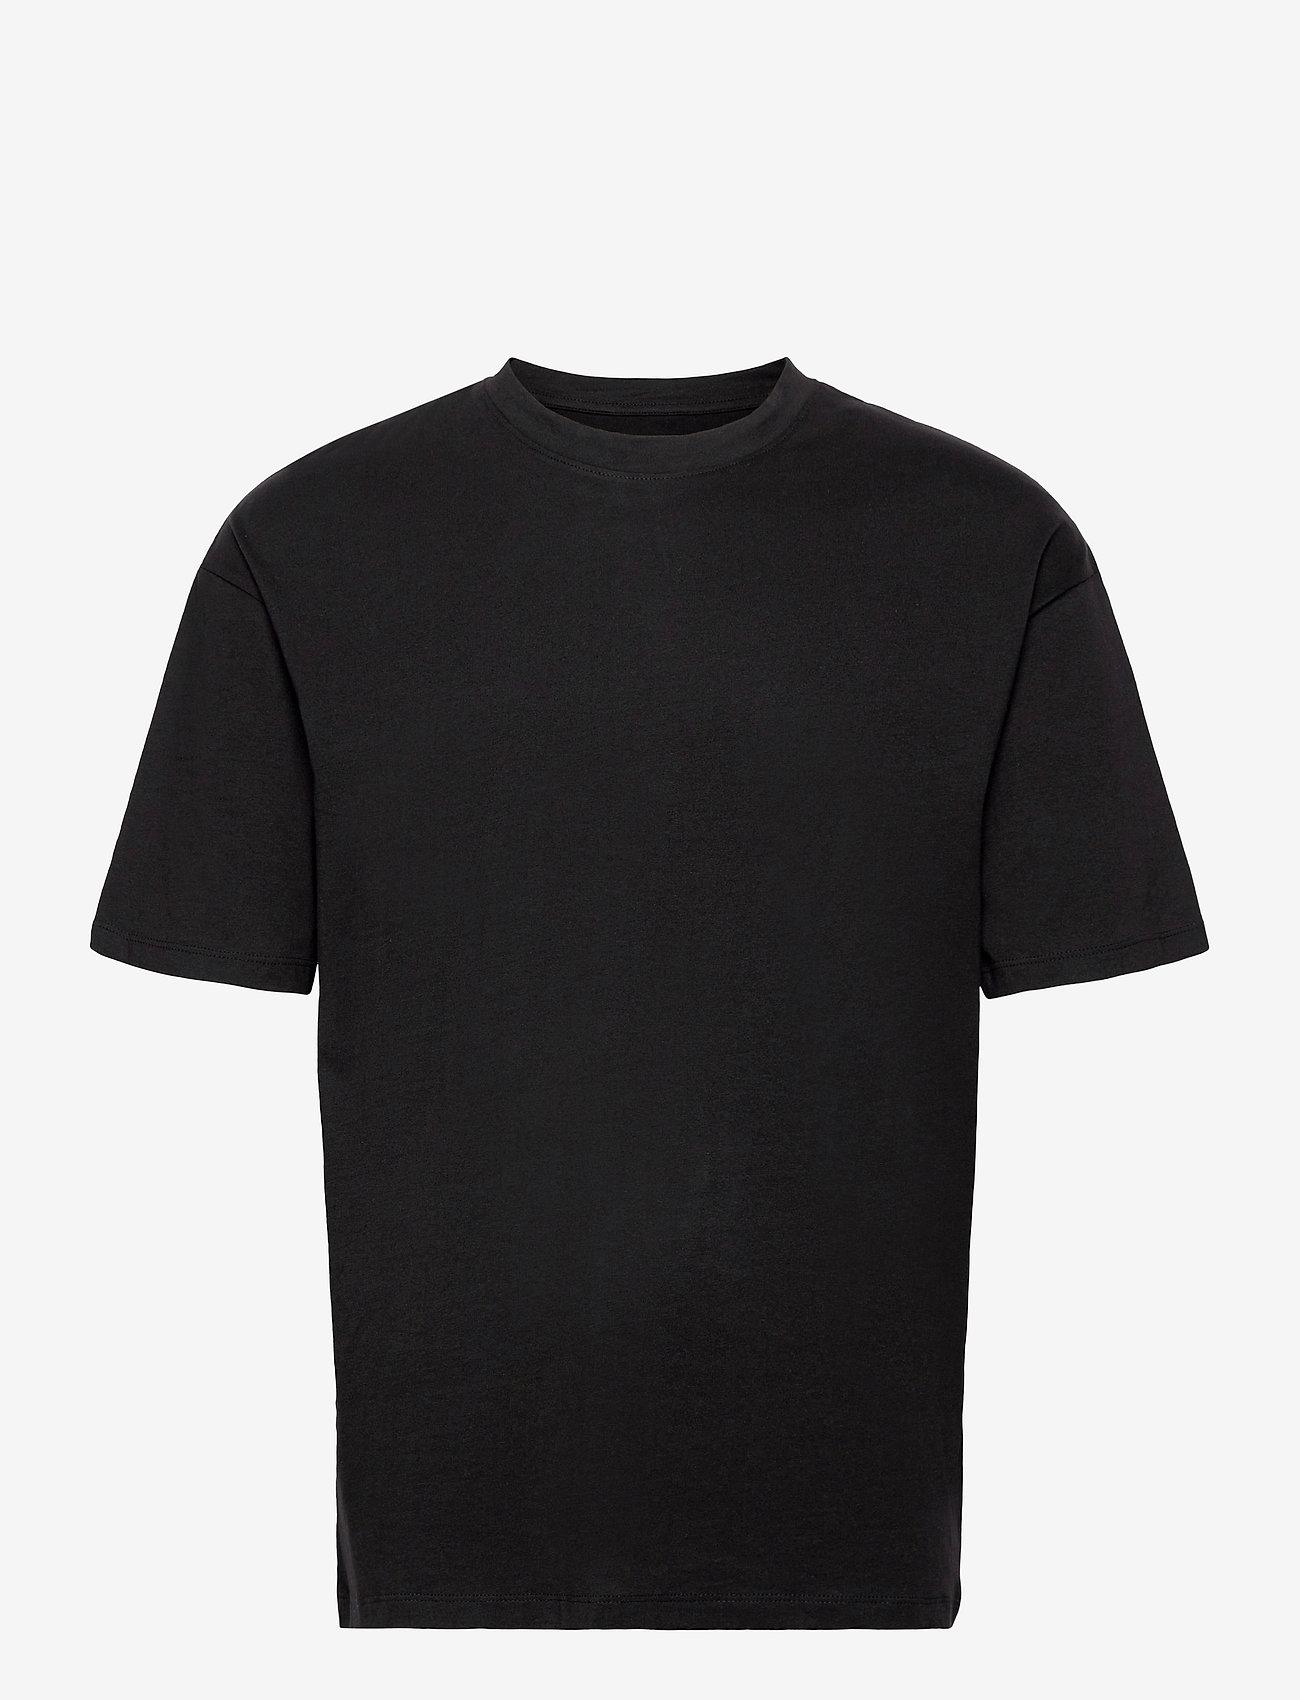 Jack & Jones - JORBRINK TEE SS CREW NECK - basic t-shirts - black - 0